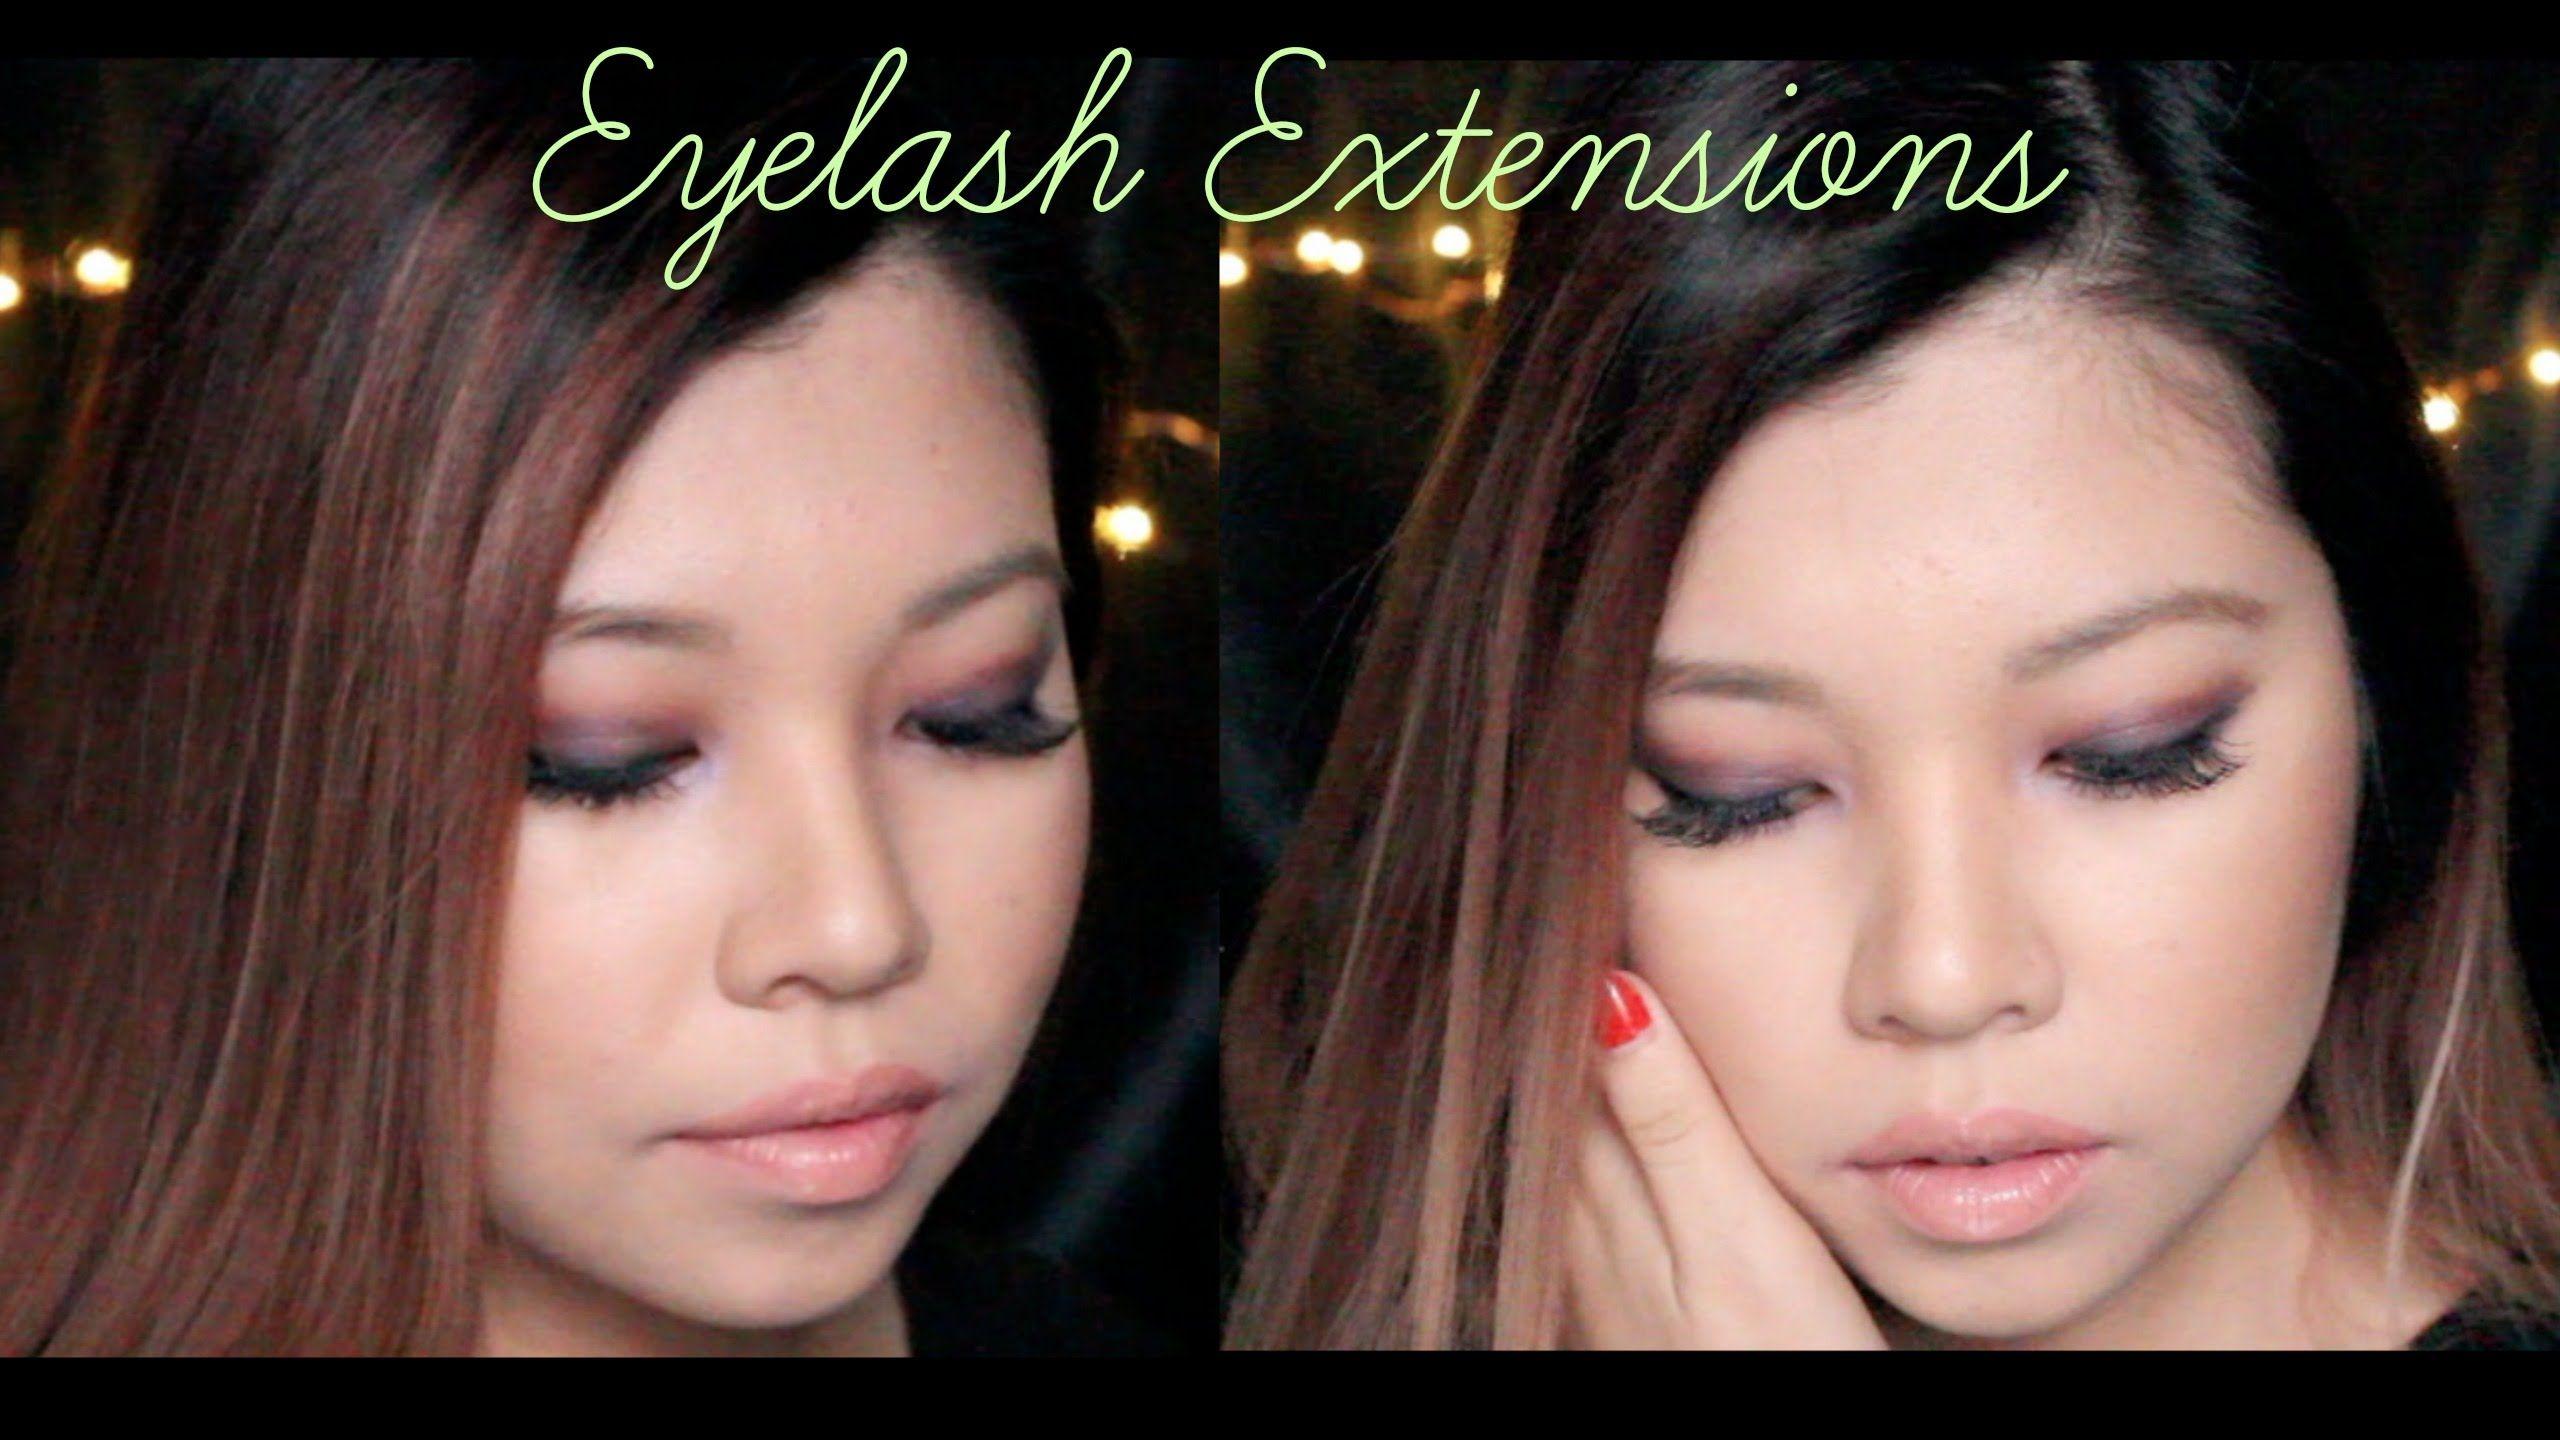 All about eyelash extensions qa eyelash extensions